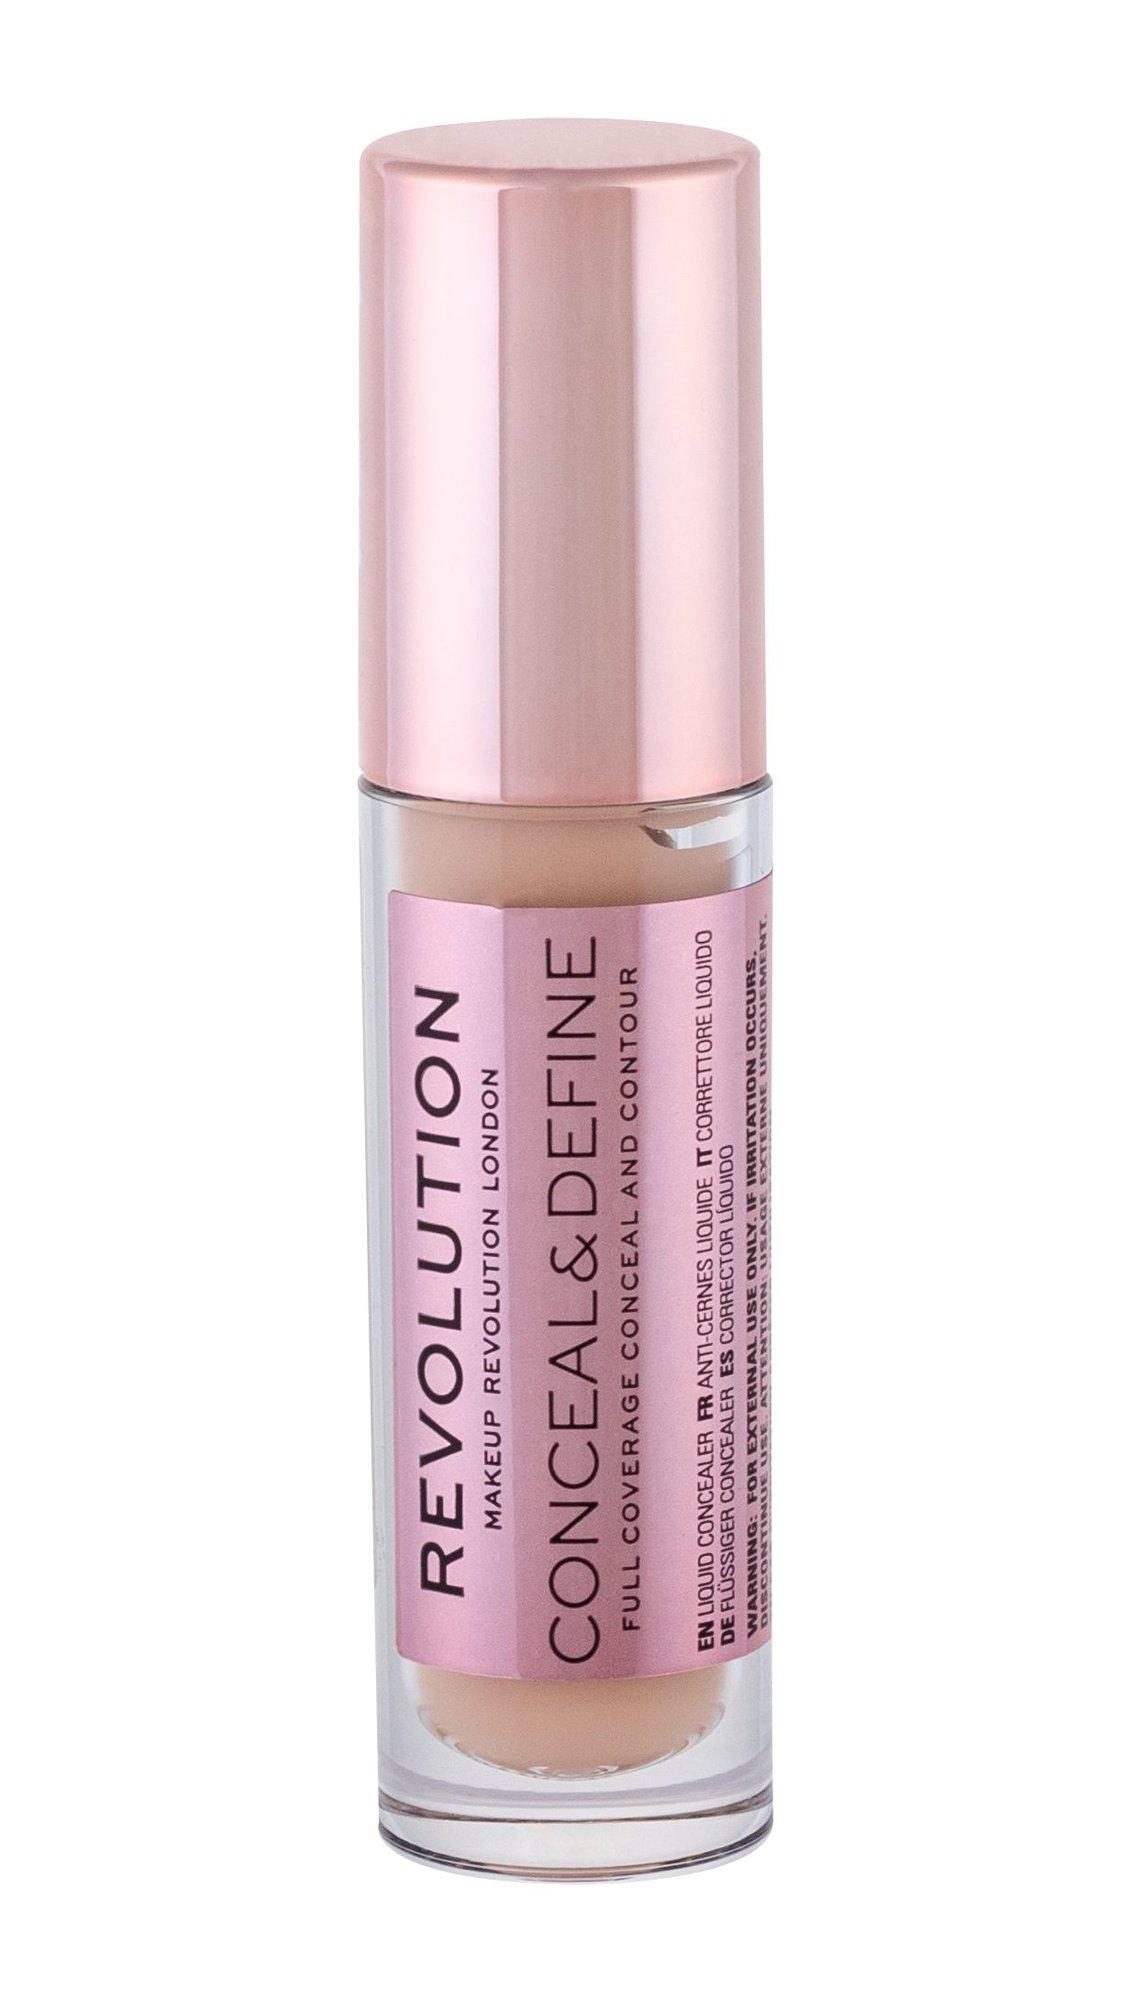 Makeup Revolution London Conceal & Define Corrector 4ml C9